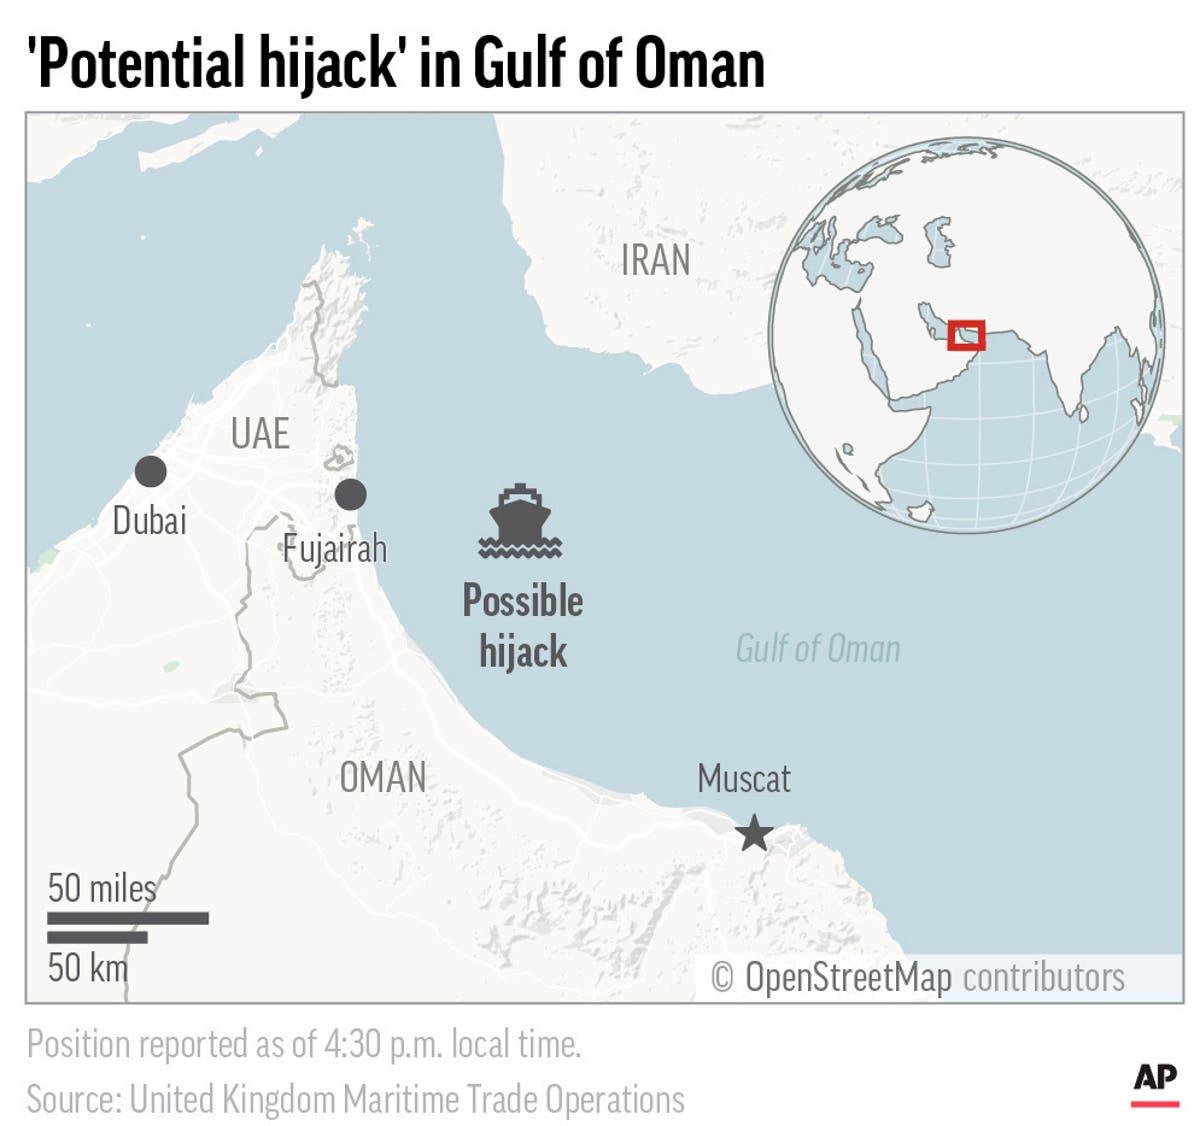 British navy group: 'Potential hijack' of ship off UAE coast